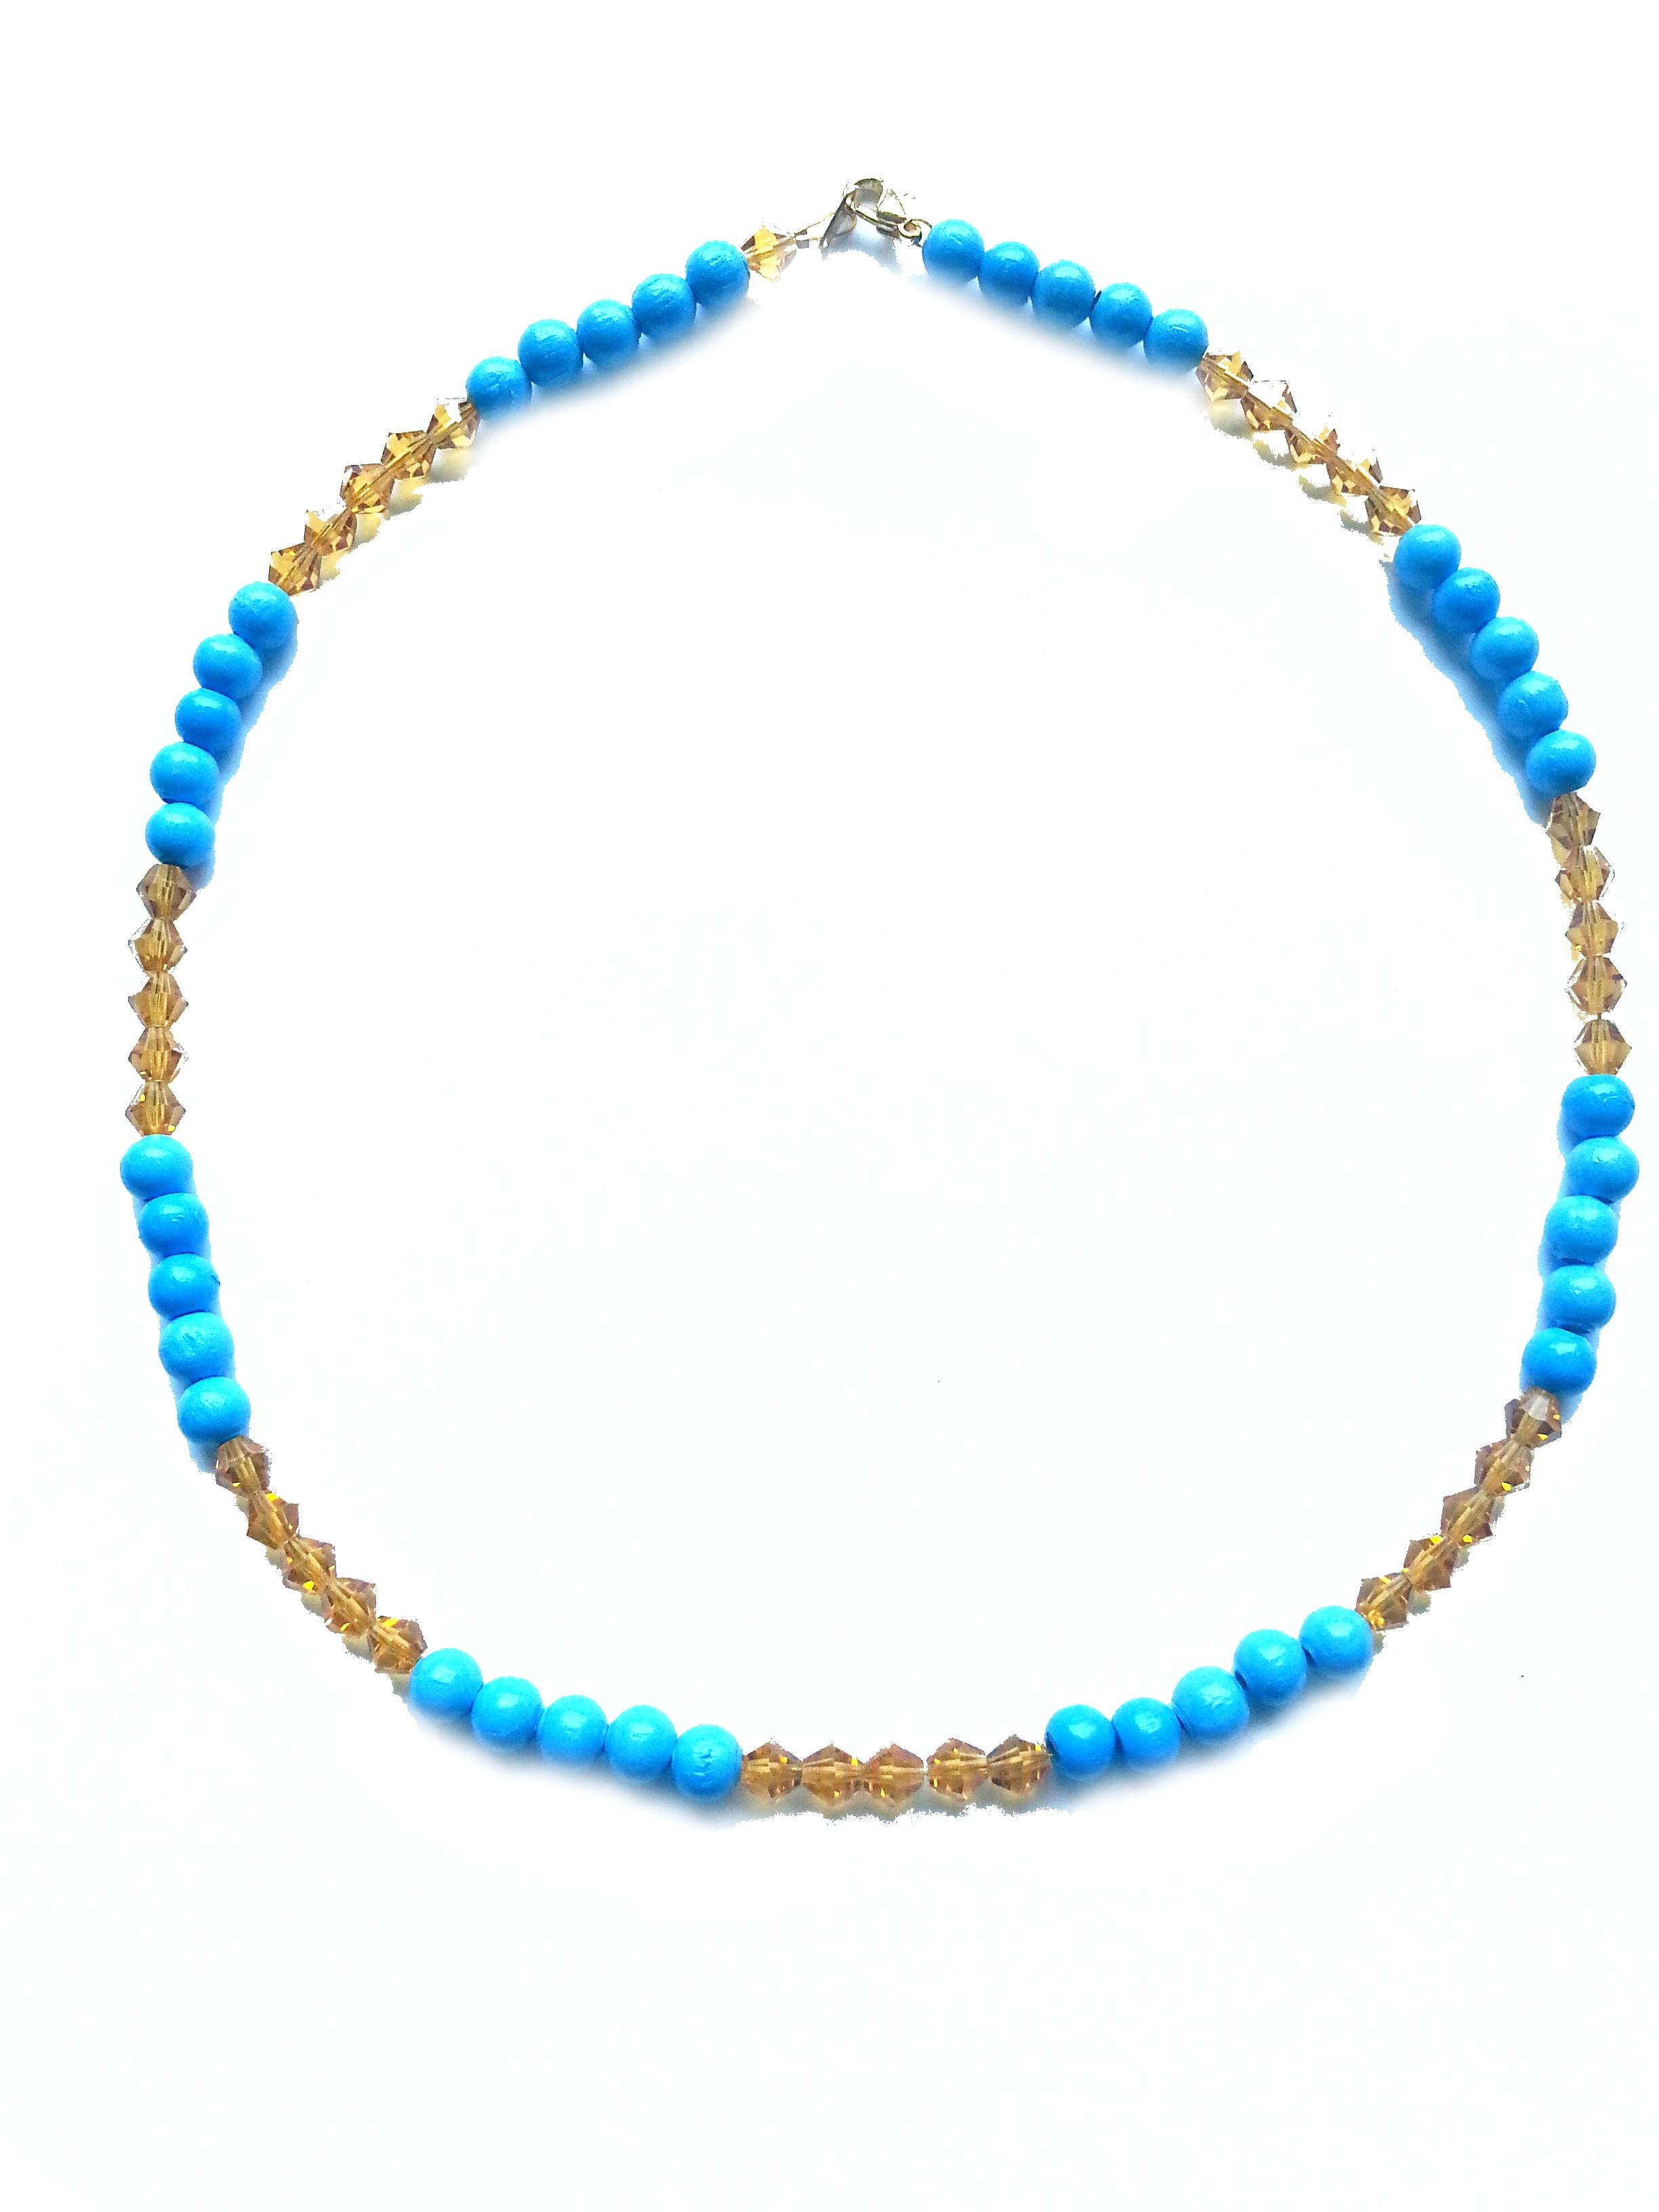 Halskette,Modeschmuck